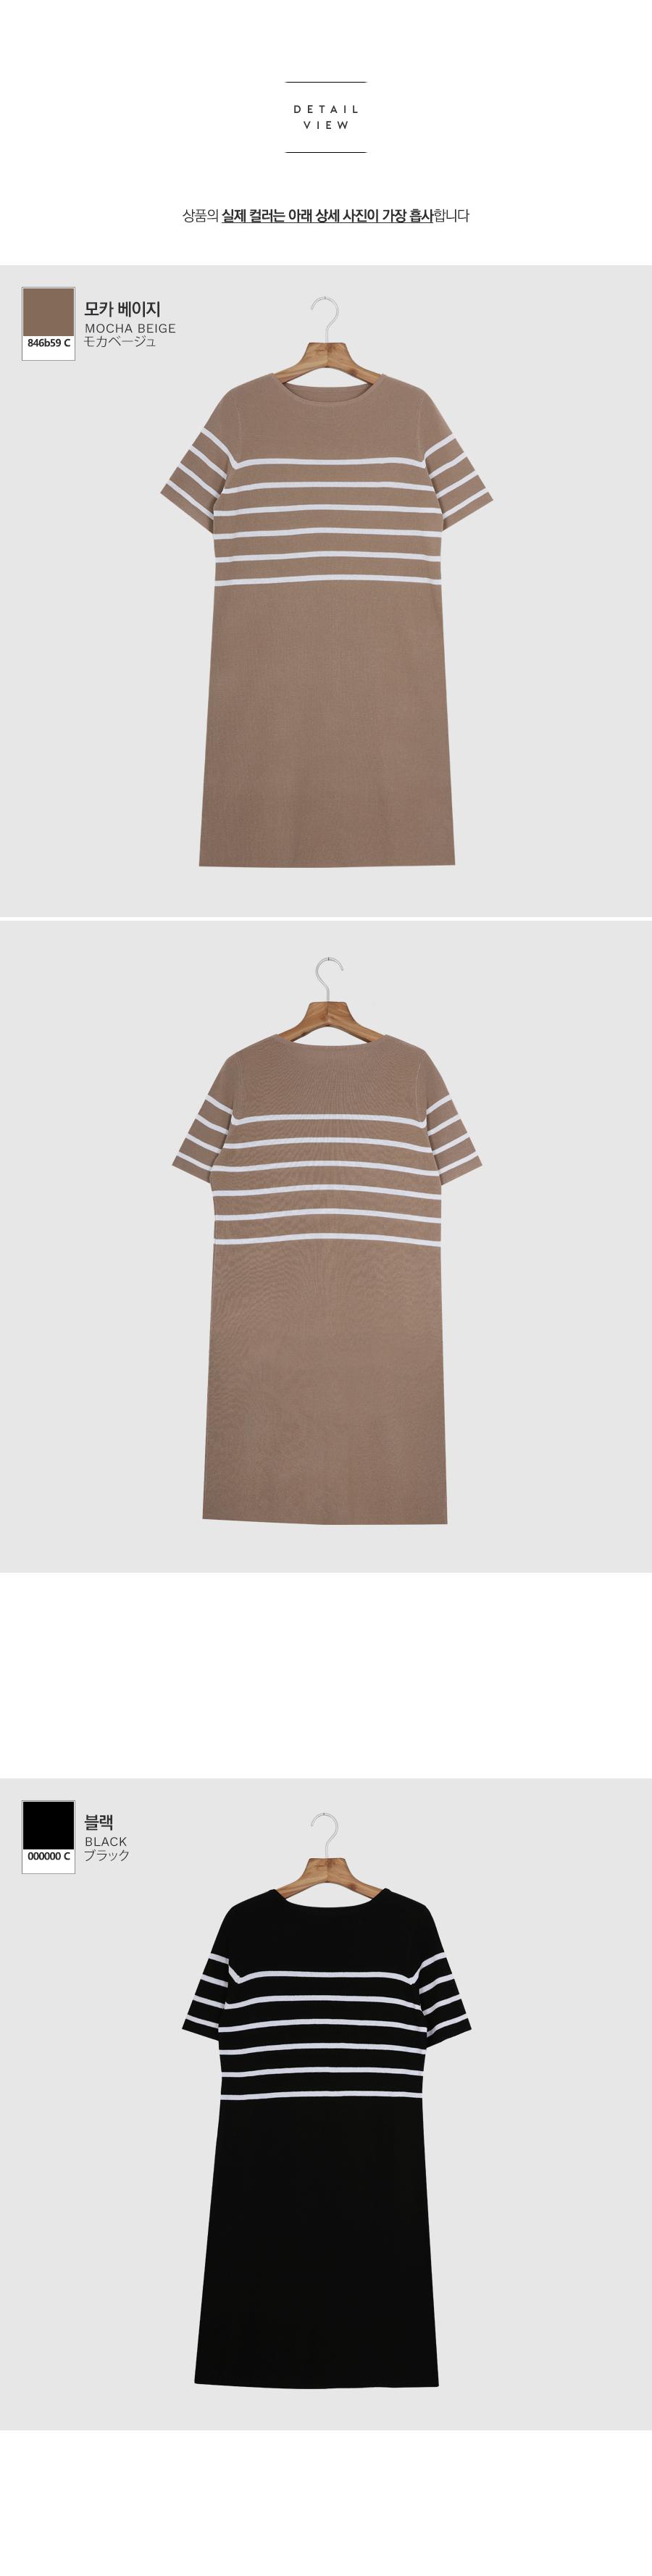 Nabal Mid Knit Dress